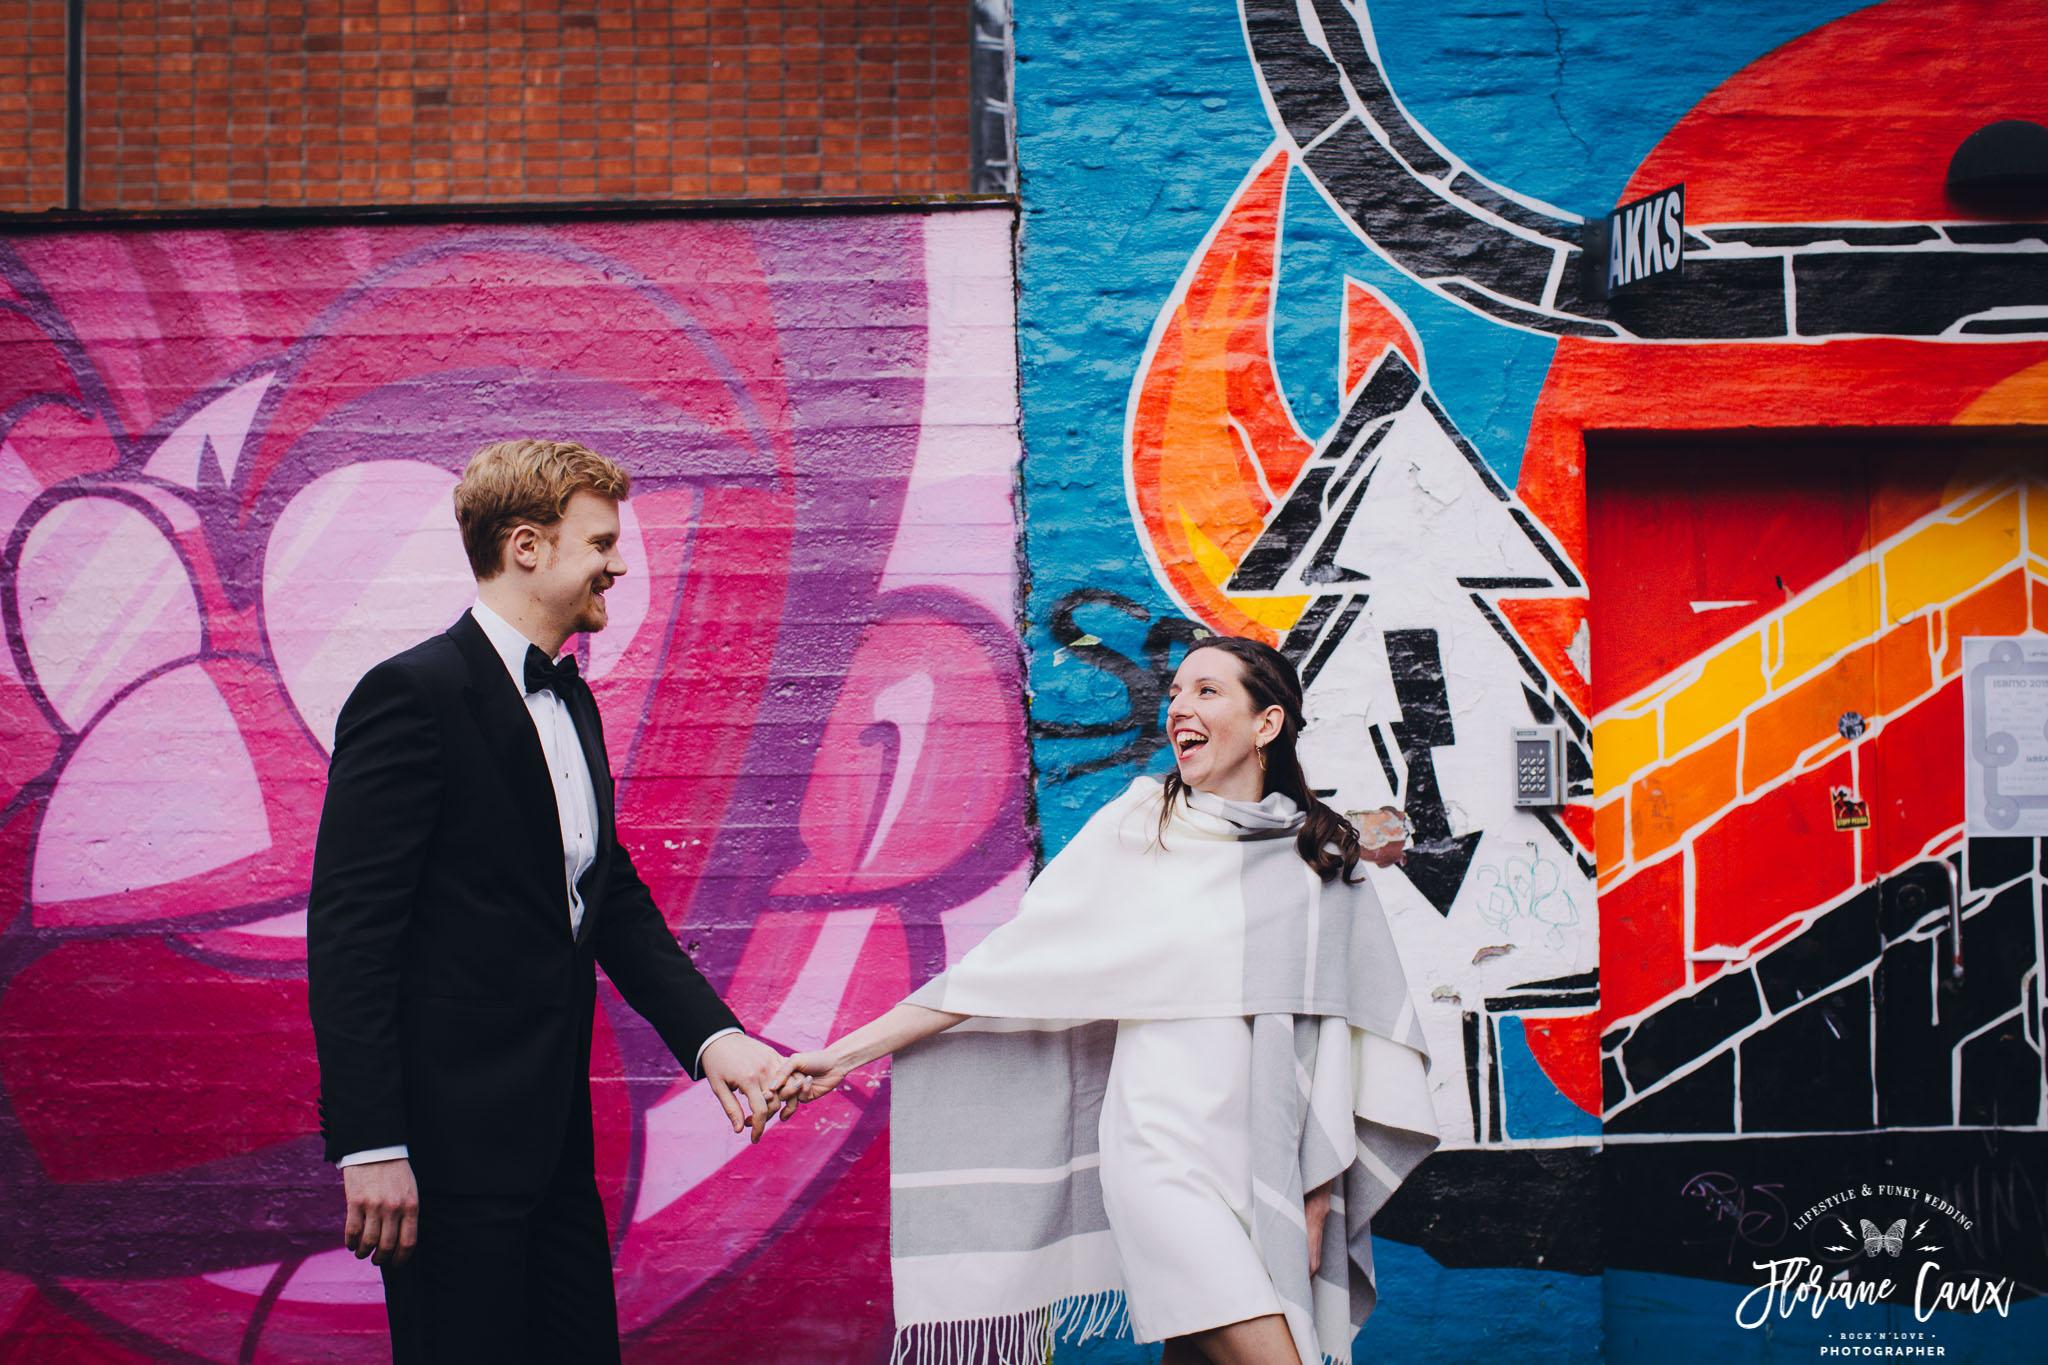 destination-wedding-photographer-oslo-norway-floriane-caux-29